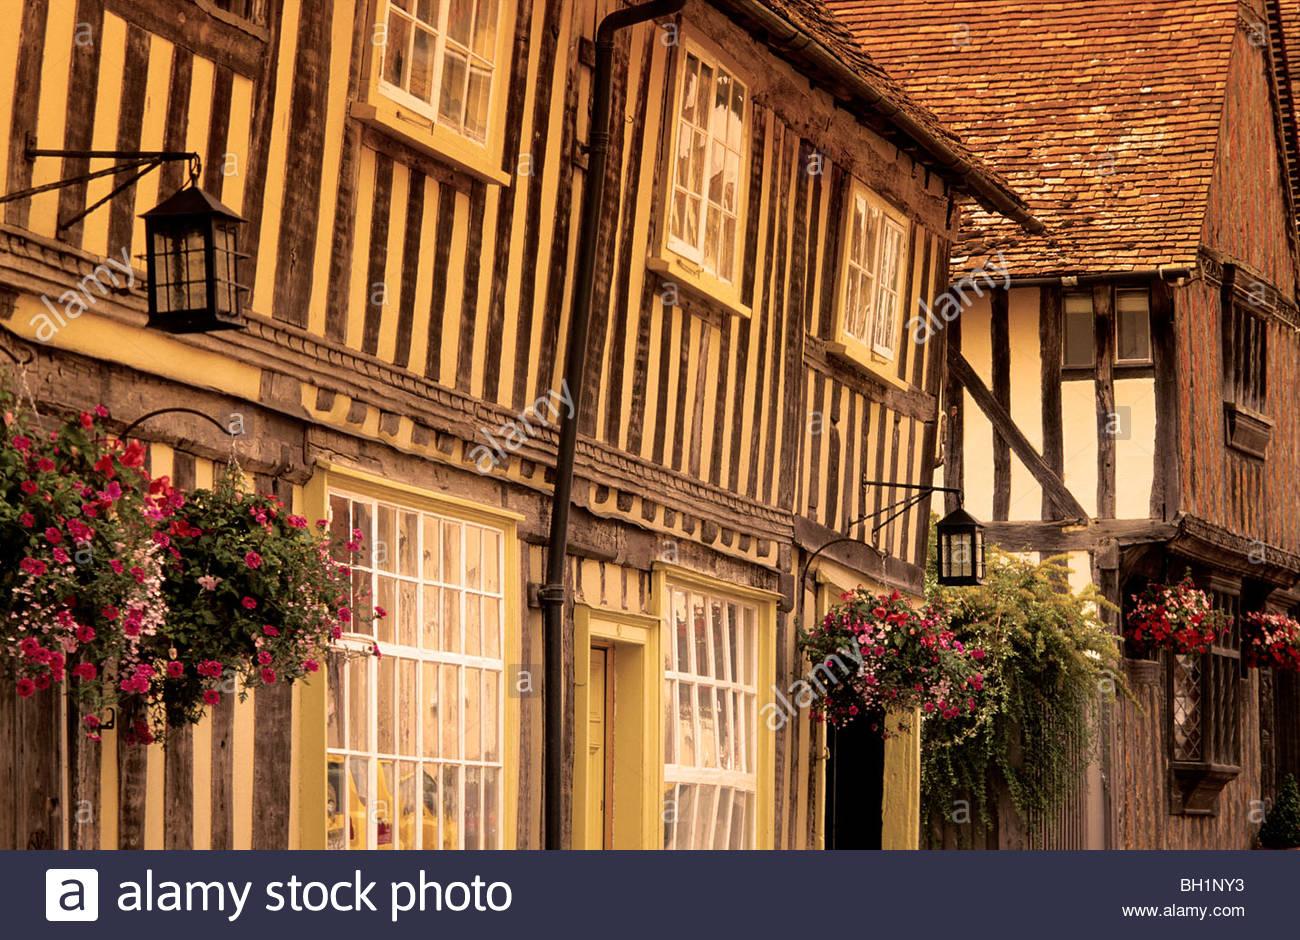 Europe, England, Suffolk, Lavenham, East Anglia, half timbered houses - Stock Image